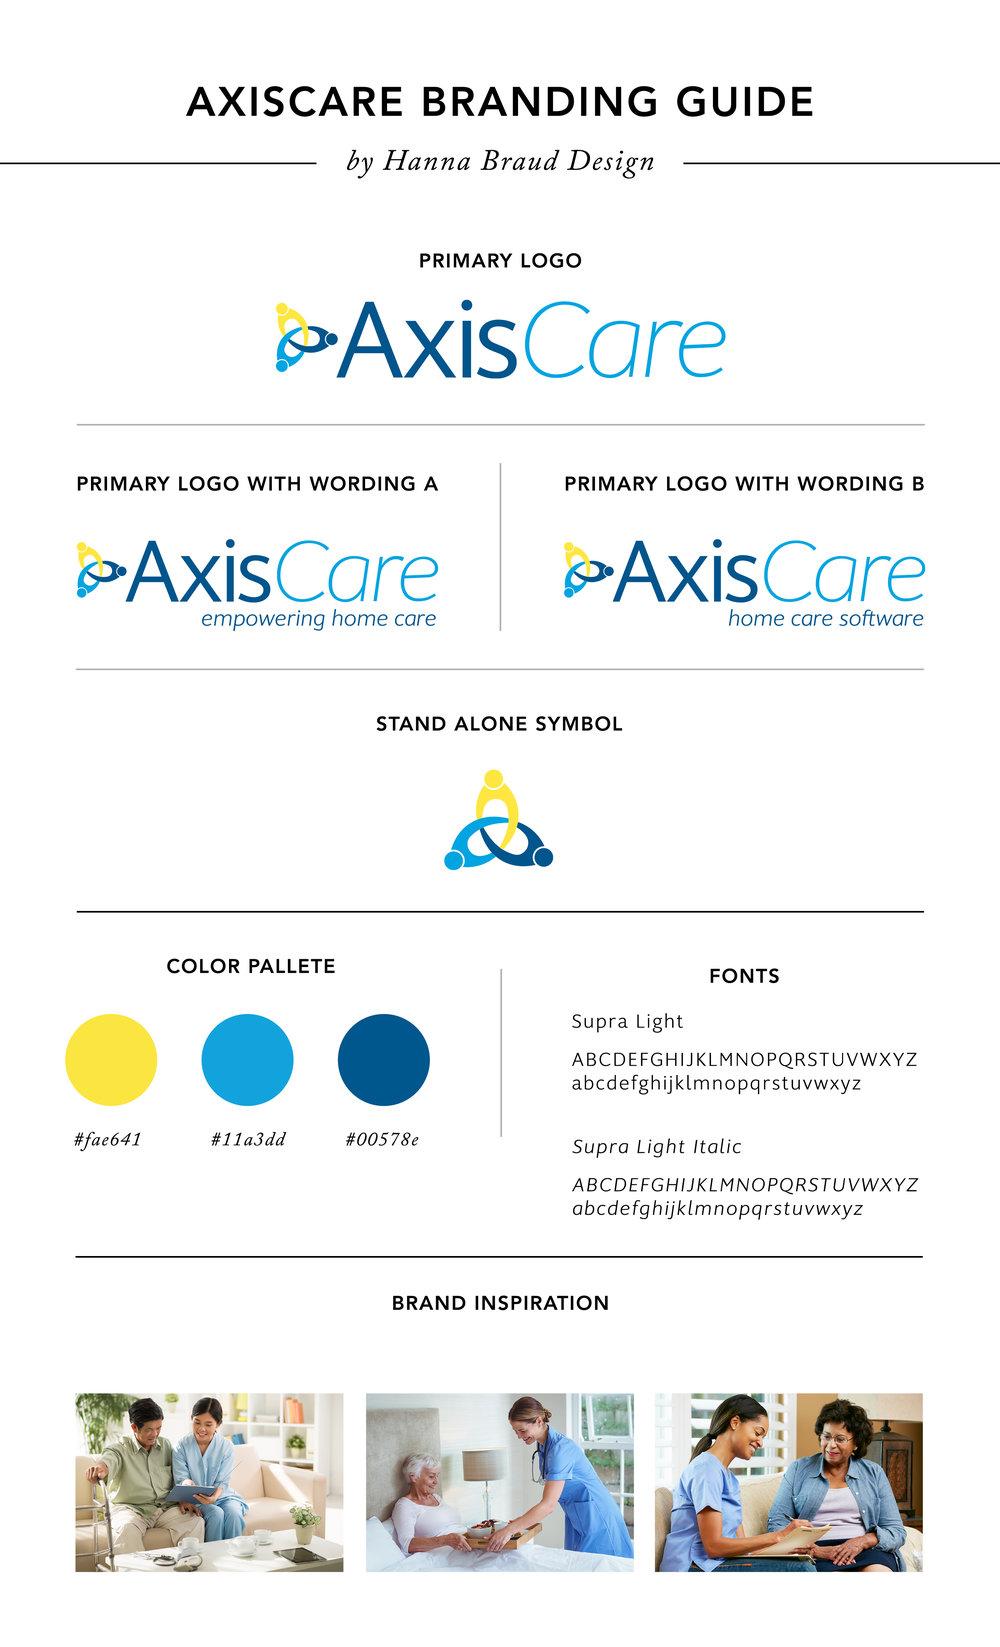 BrandingGuide_AxisCare.jpg